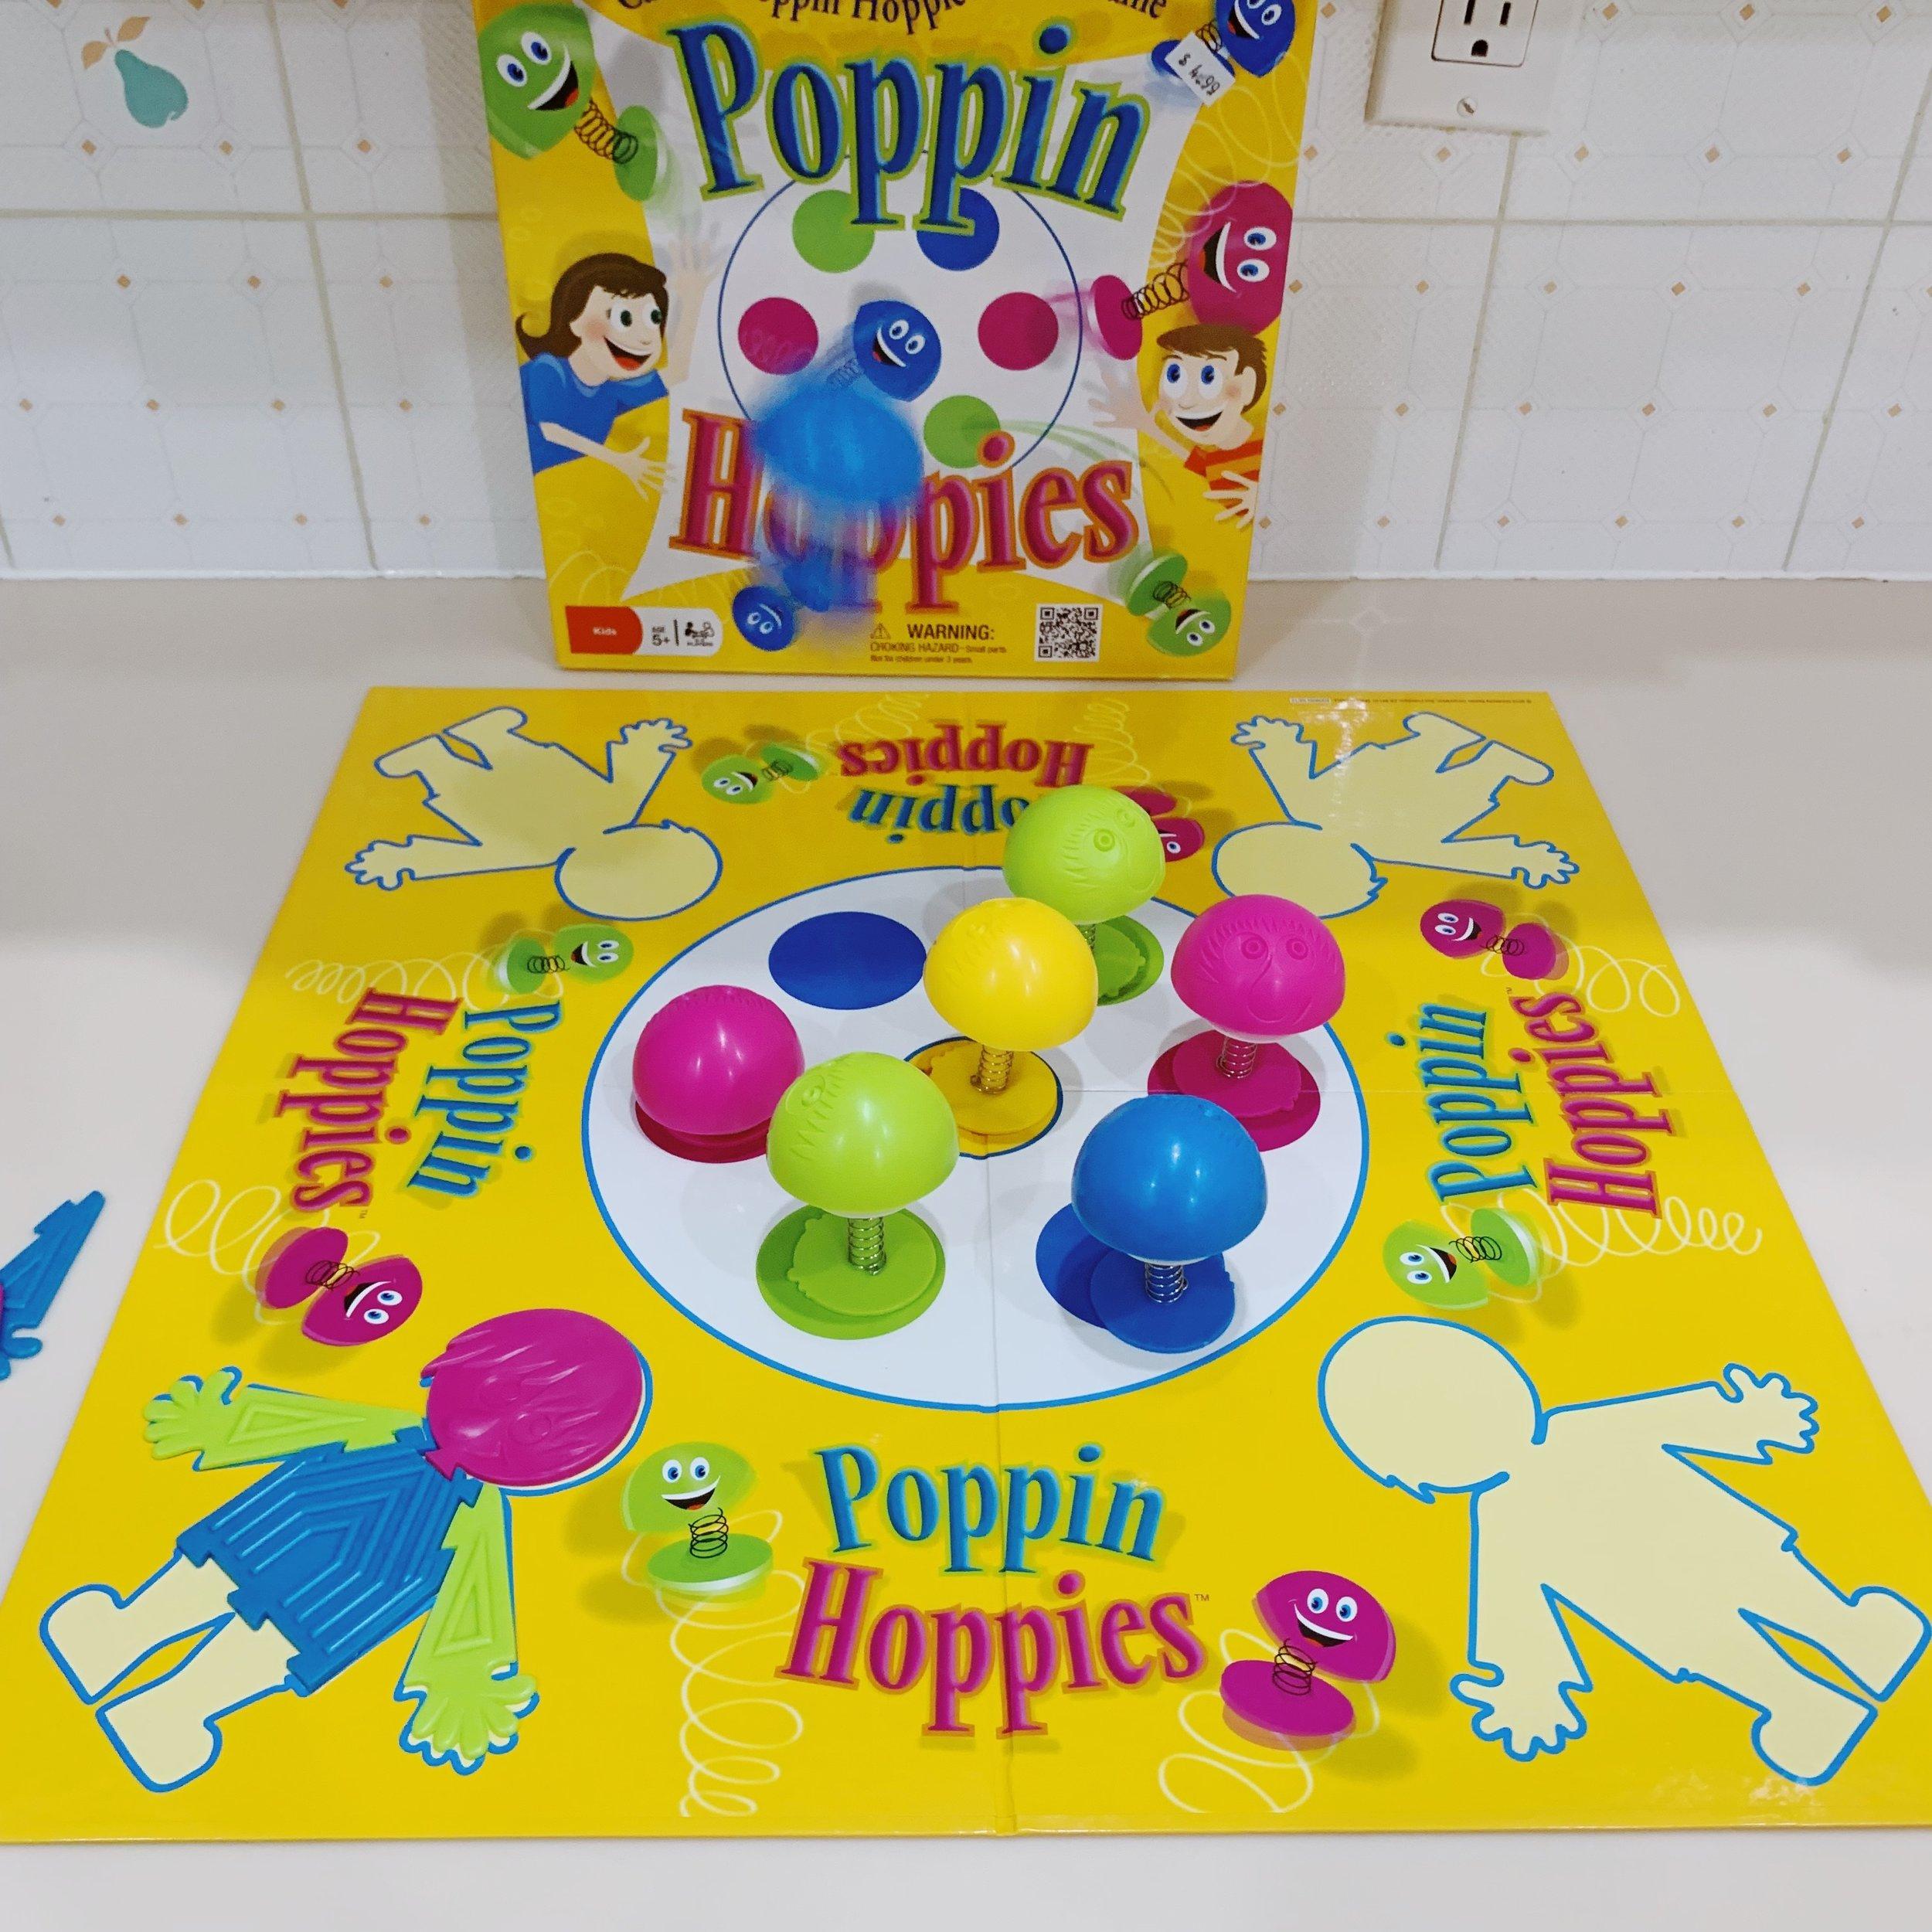 poppinhoppies2.jpg